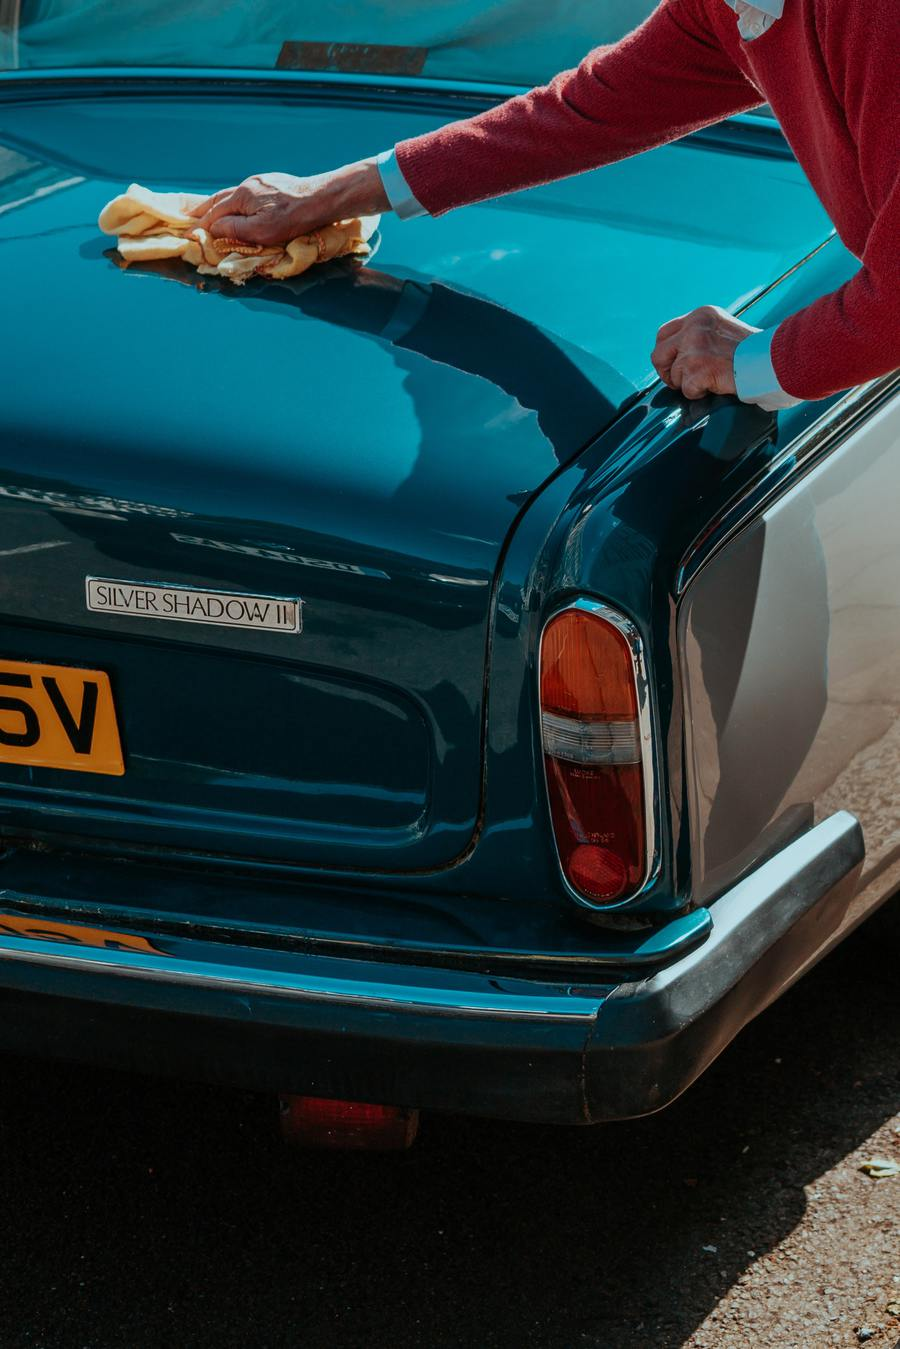 A person waxing a car